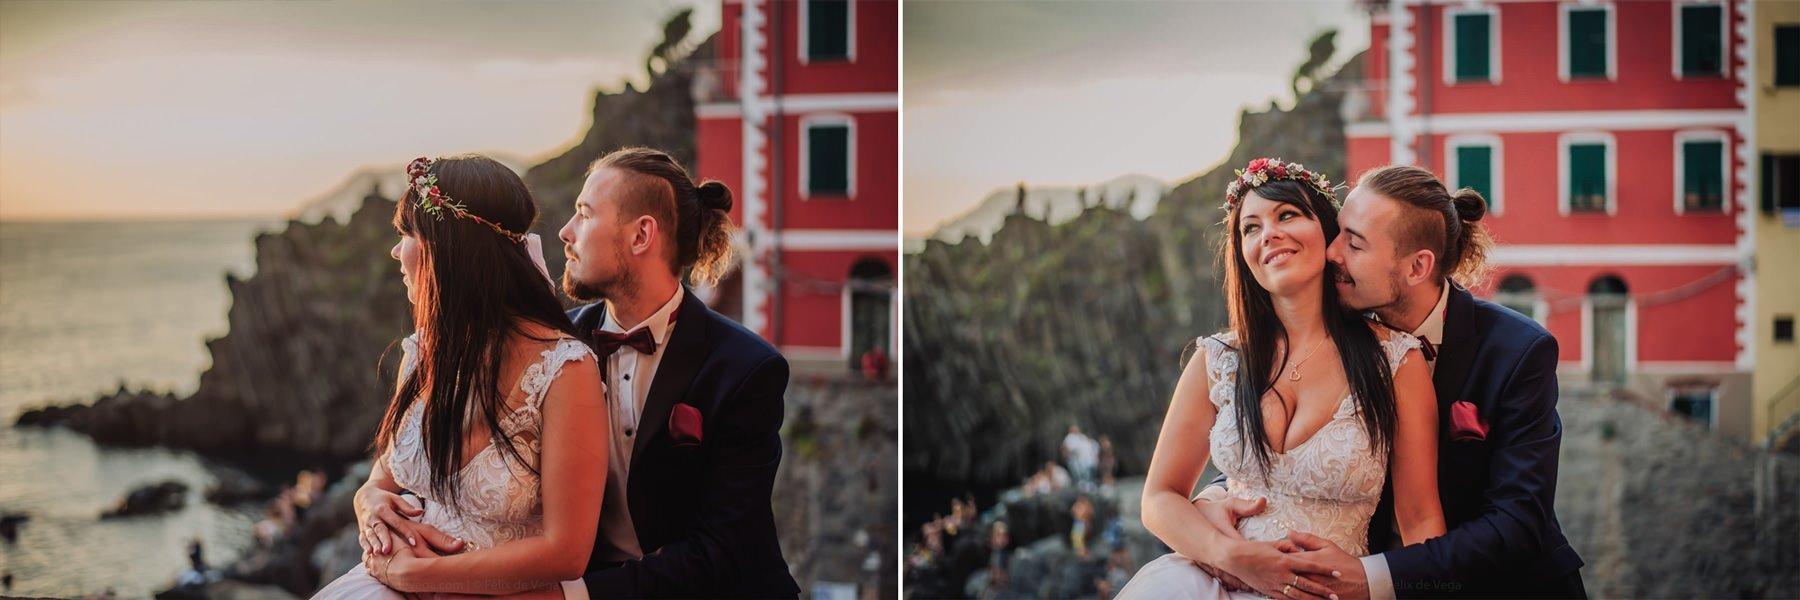 italian wedding wedding on destination italy